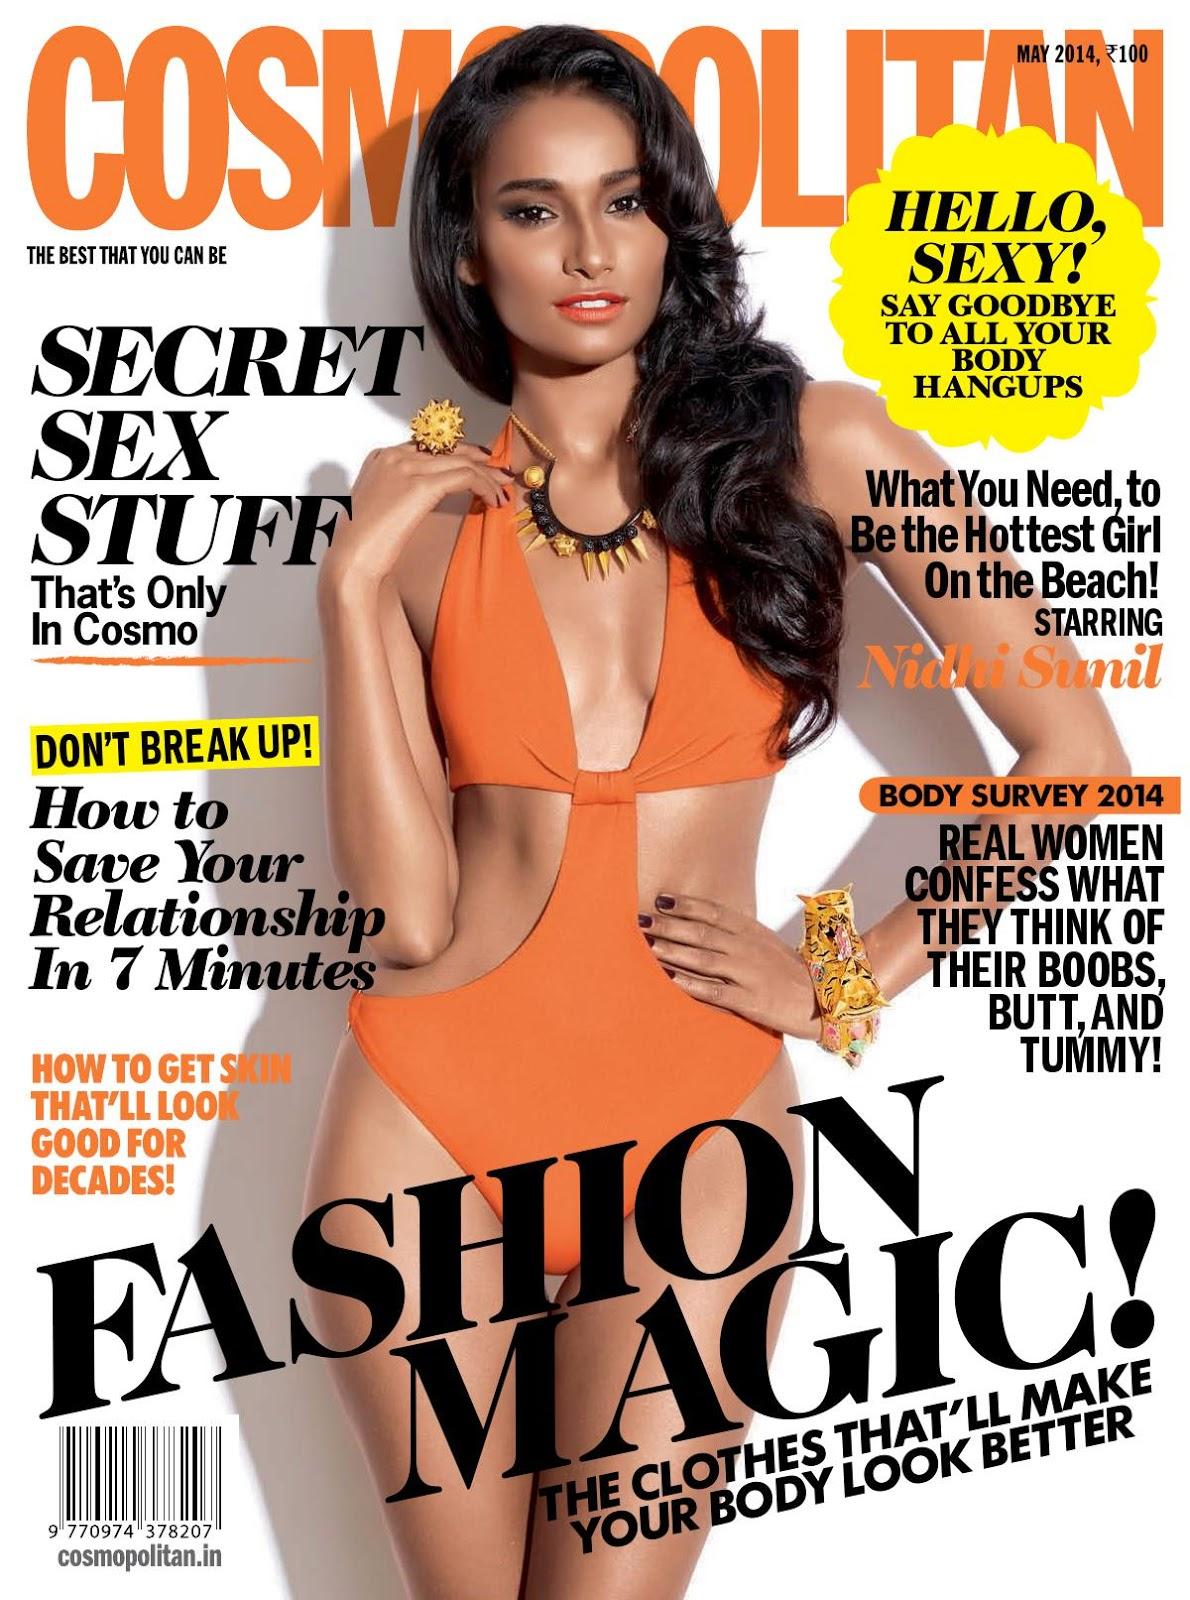 Nidhi Sunil For Cosmopolitan Magazine, India, May 2014